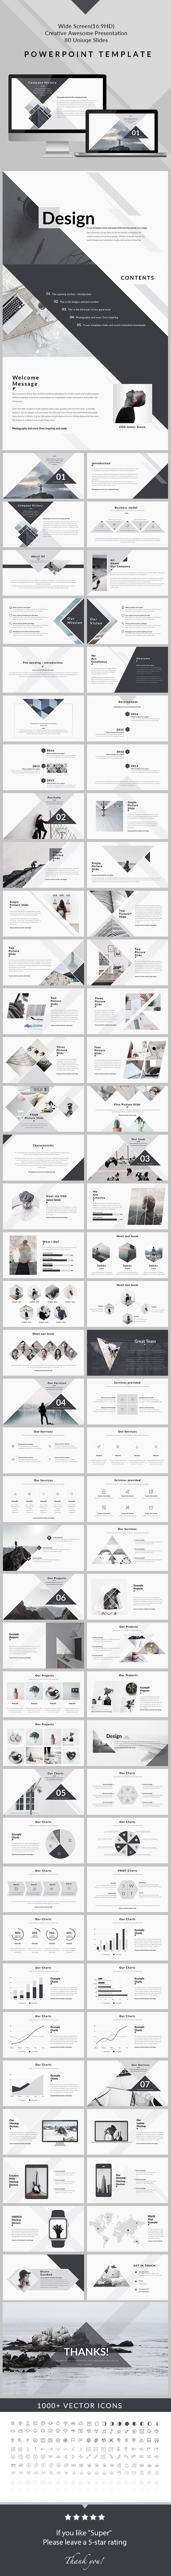 Design - Clean & Creative PowerPoint Presentation Template